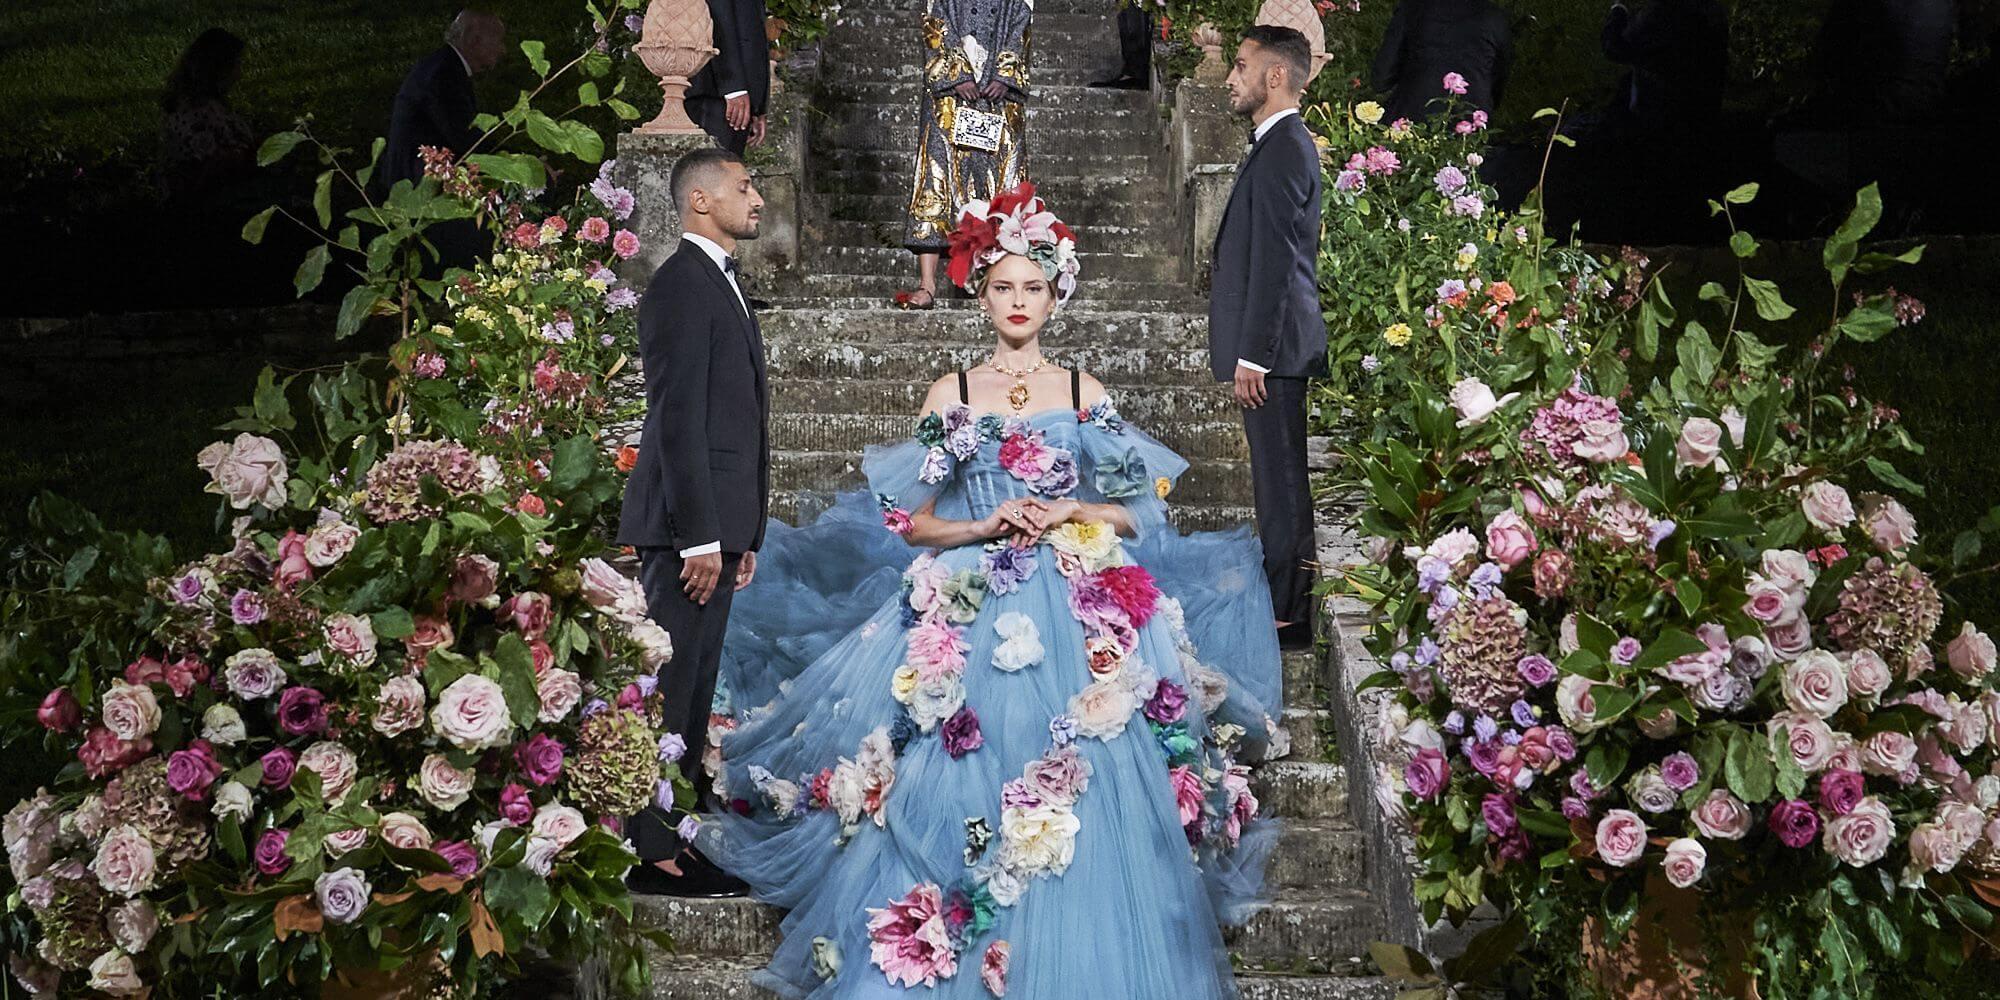 vestiti-alta-moda-dolce-gabbana-sfilata-firenze-1599212988